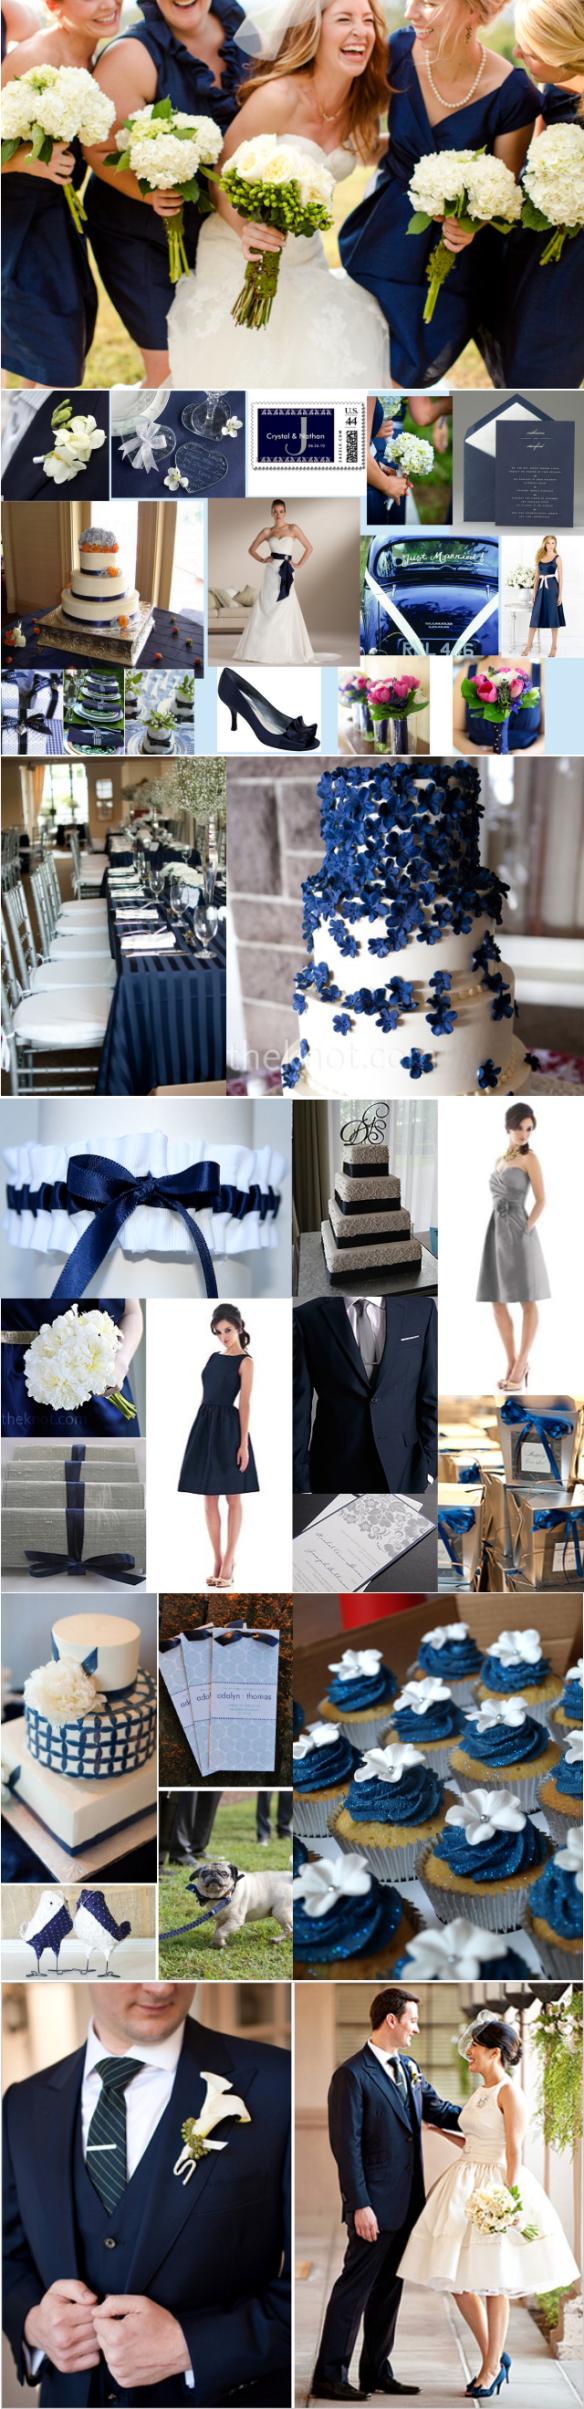 Navy and White wedding inspiration